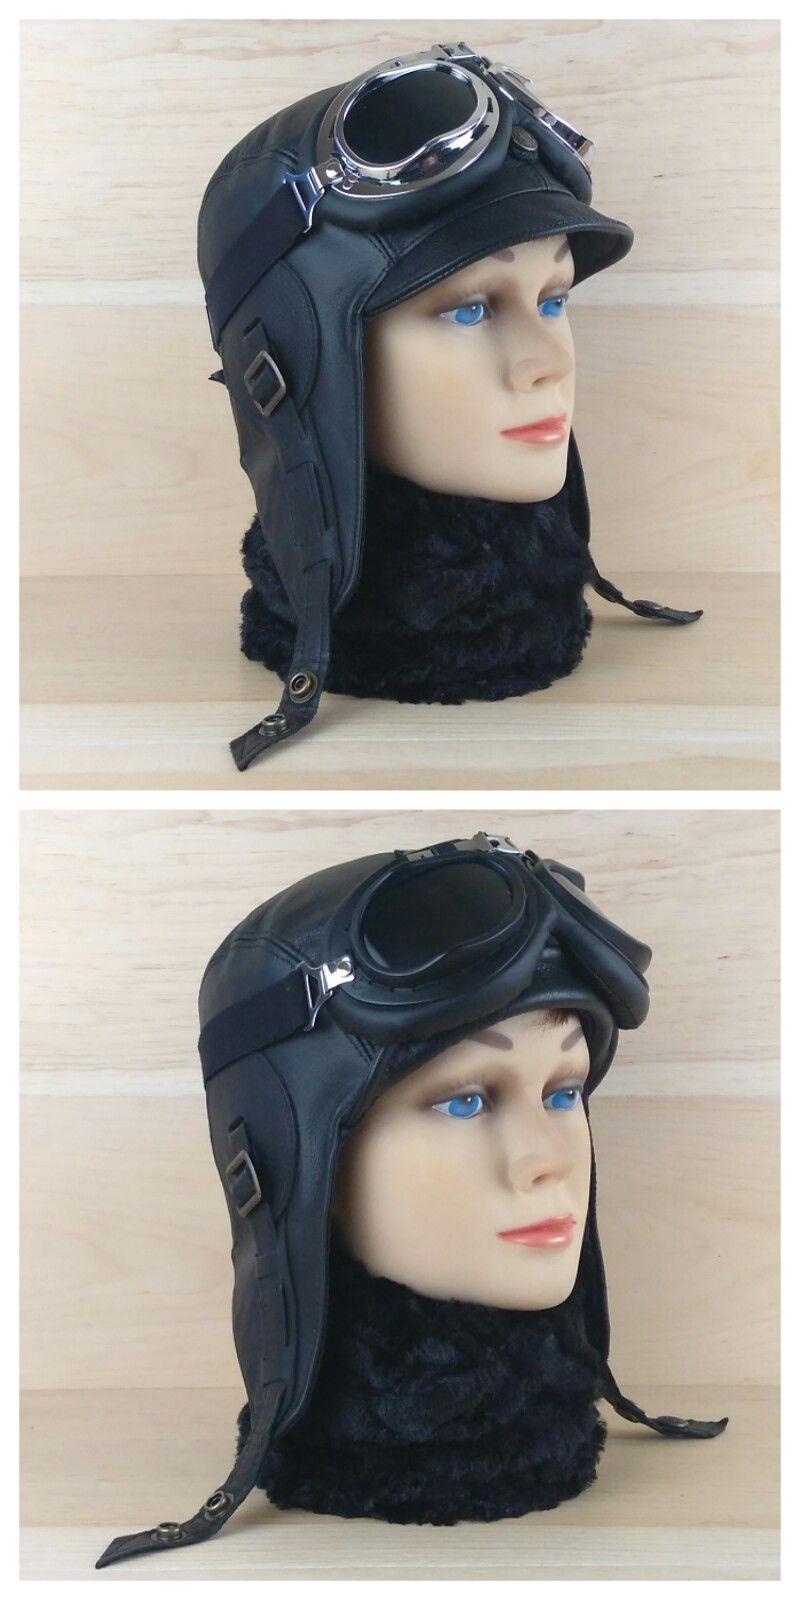 Pilot Style Motorcycle Helmet : pilot, style, motorcycle, helmet, 服装, Aviator, Black, Leather,